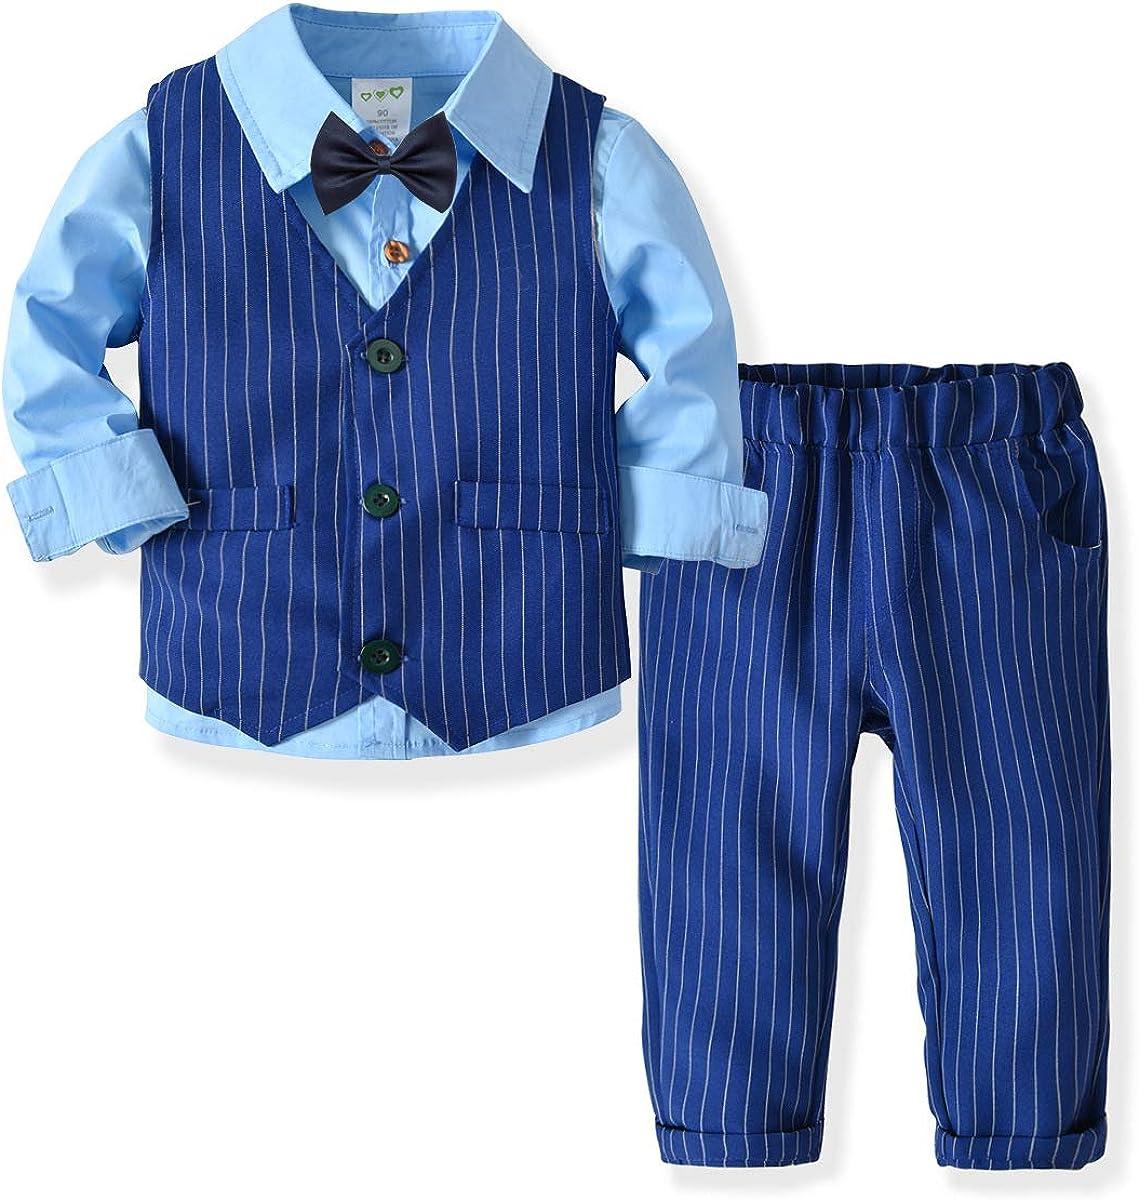 Zoerea Bambini Ragazzi Abbigliamento Set Camicia con Papillon Pantaloni Ragazzo Gentleman Nozze Smoking Battesimo Completino Gilet